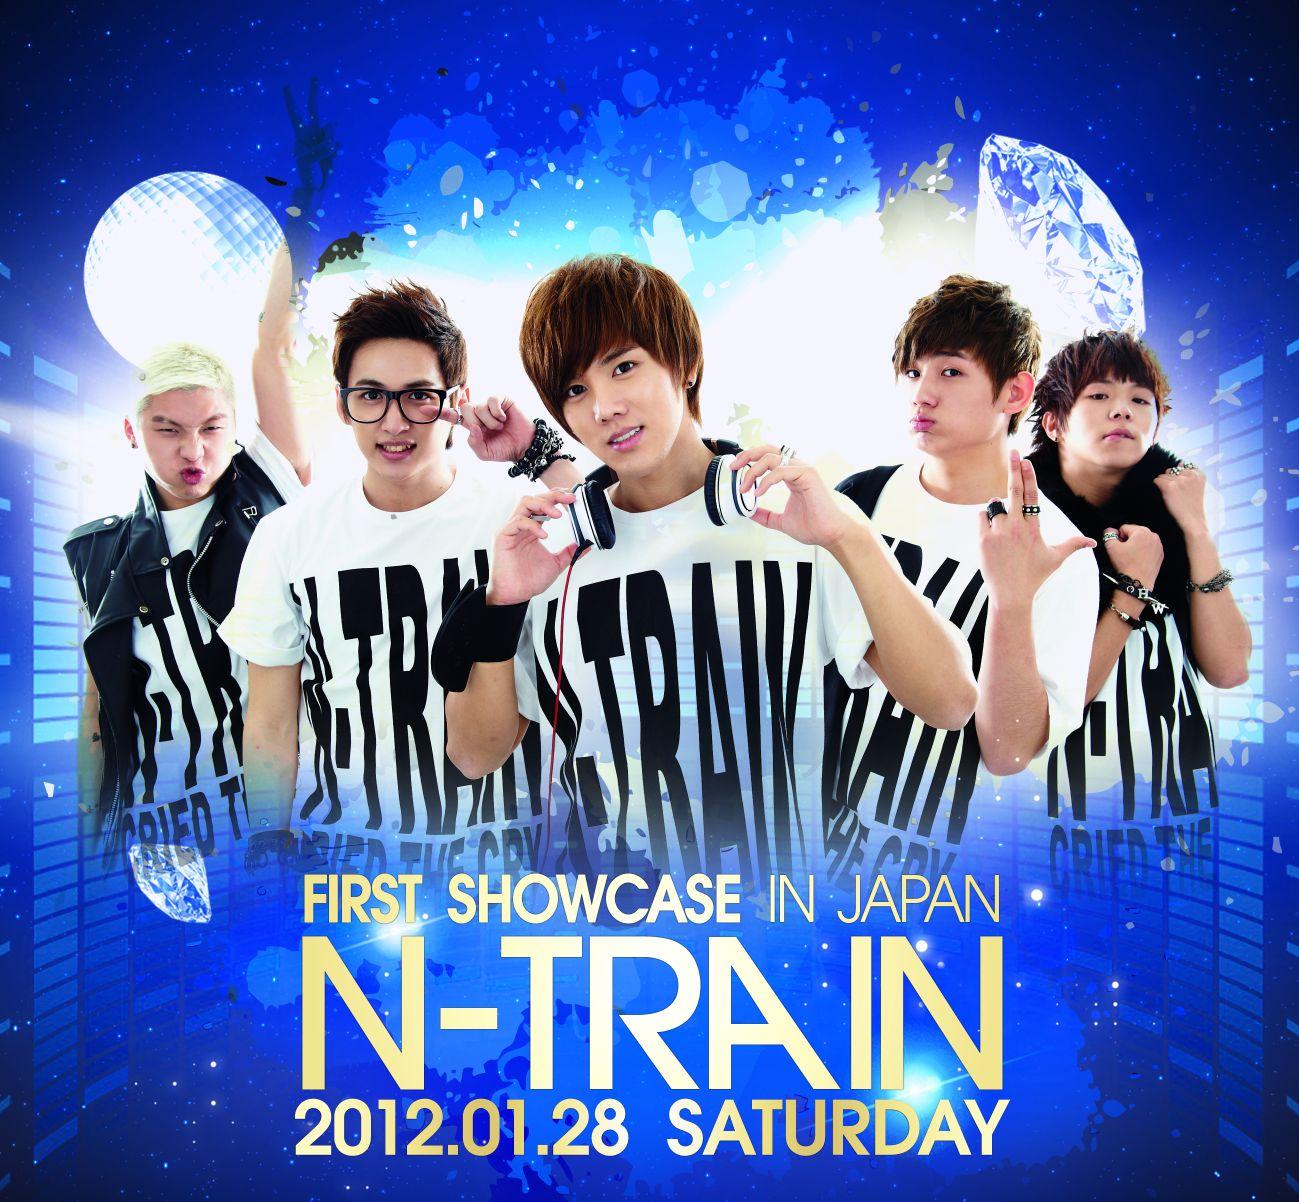 N-TRAIN First Showcase in Japan 2012~抜群の歌唱力とハーモニーで聴かせるこれまでの概念を壊すアイドルN-TRAIN日本初公演開催~